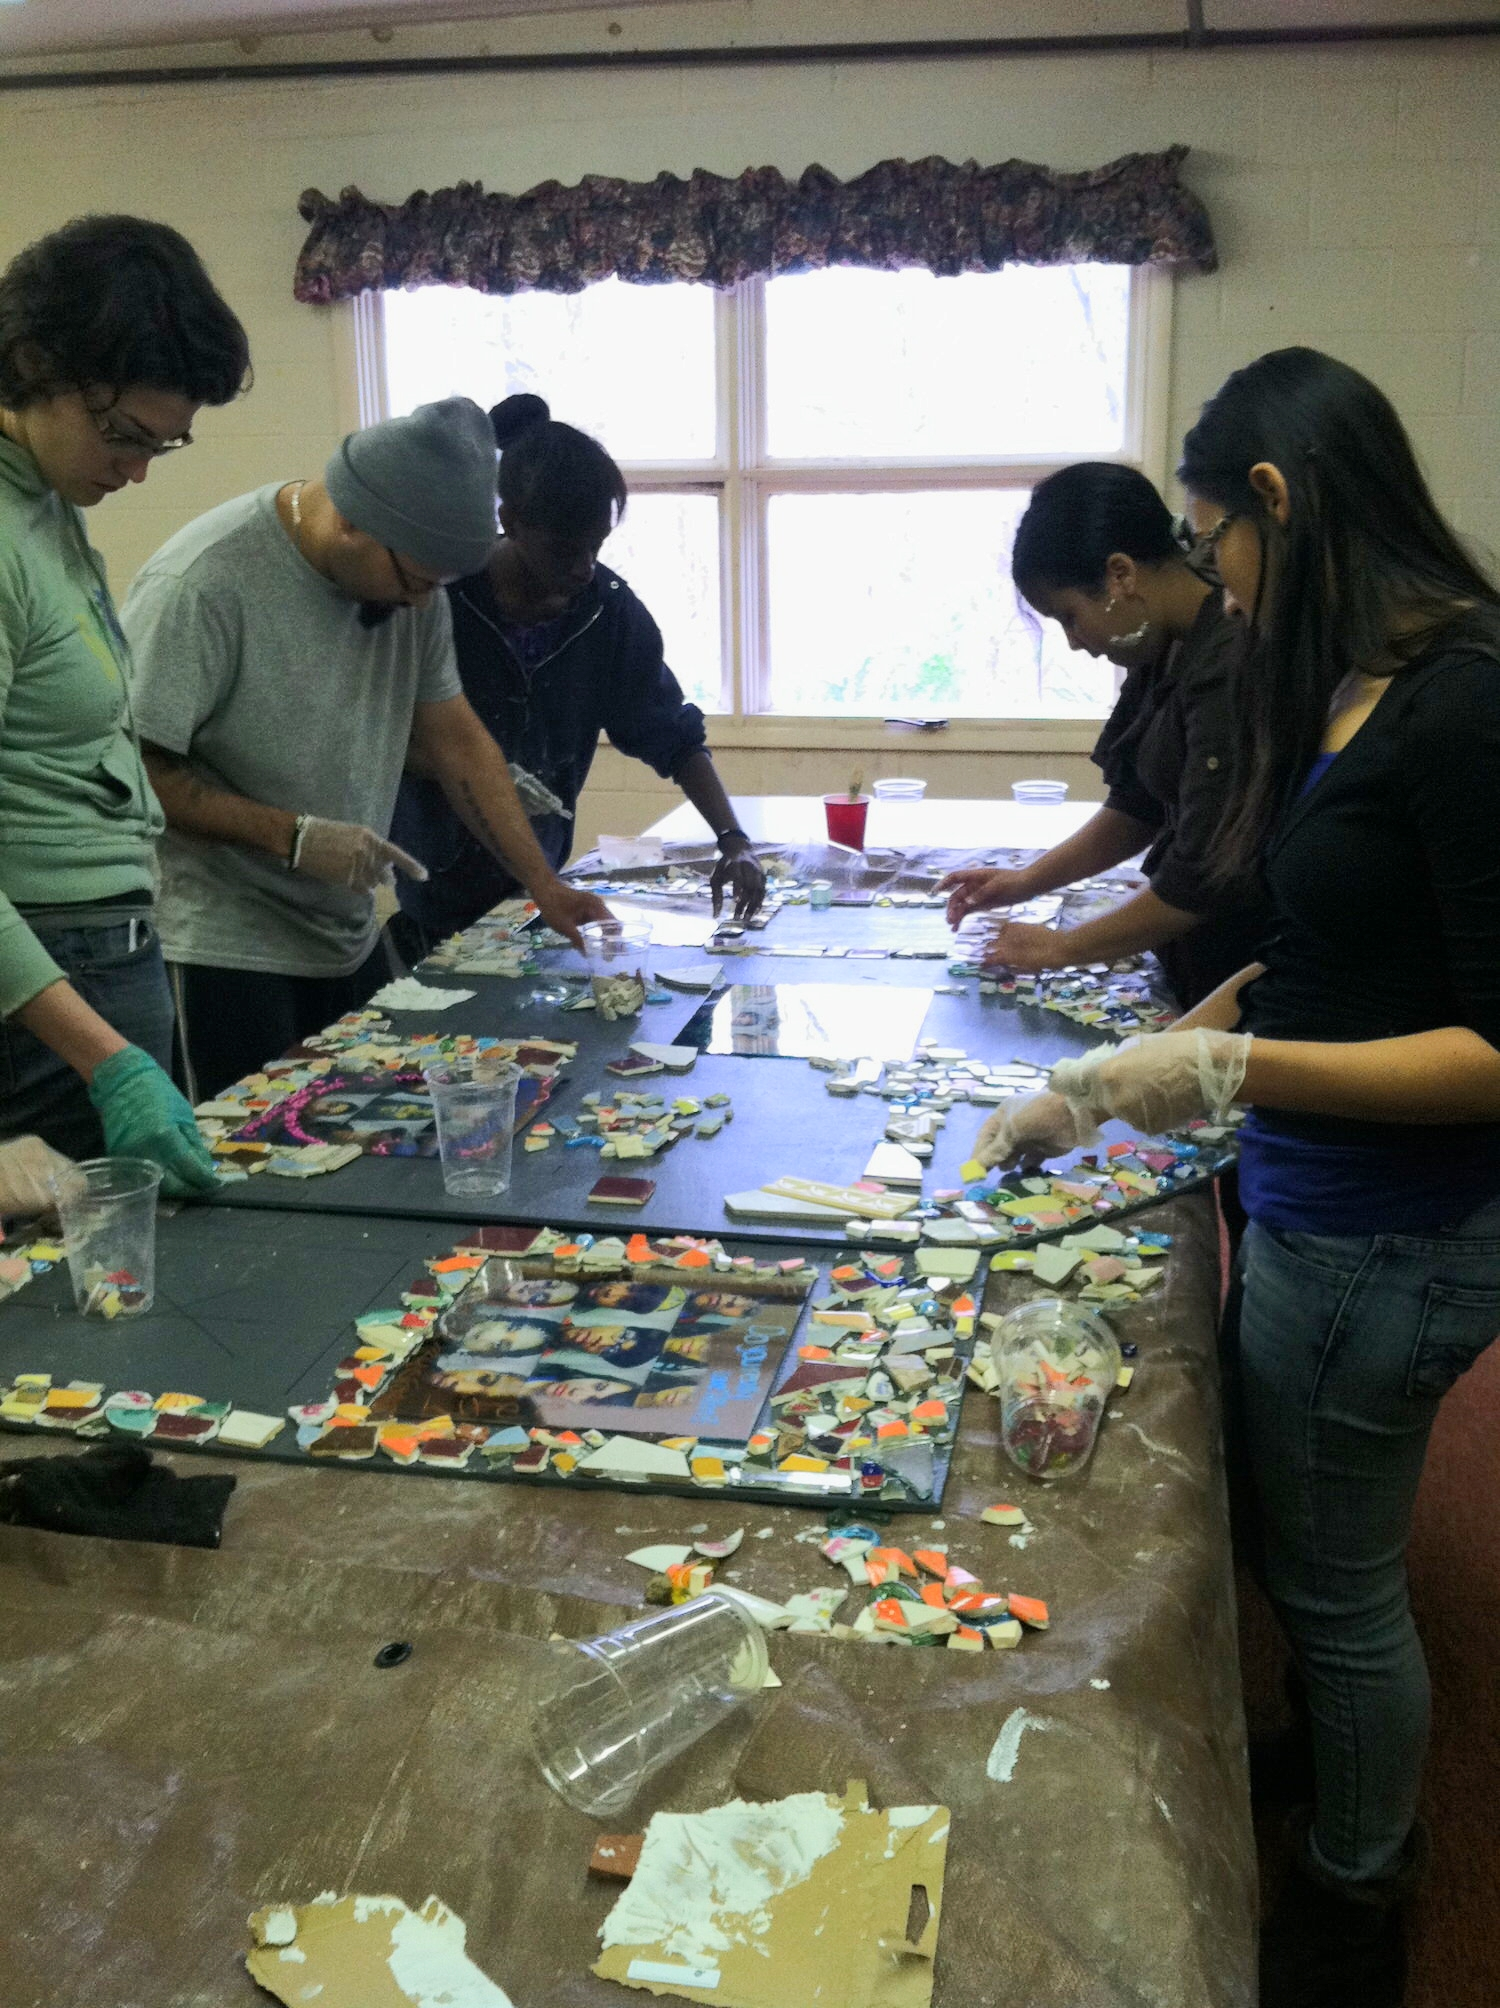 Creating the Mosaic